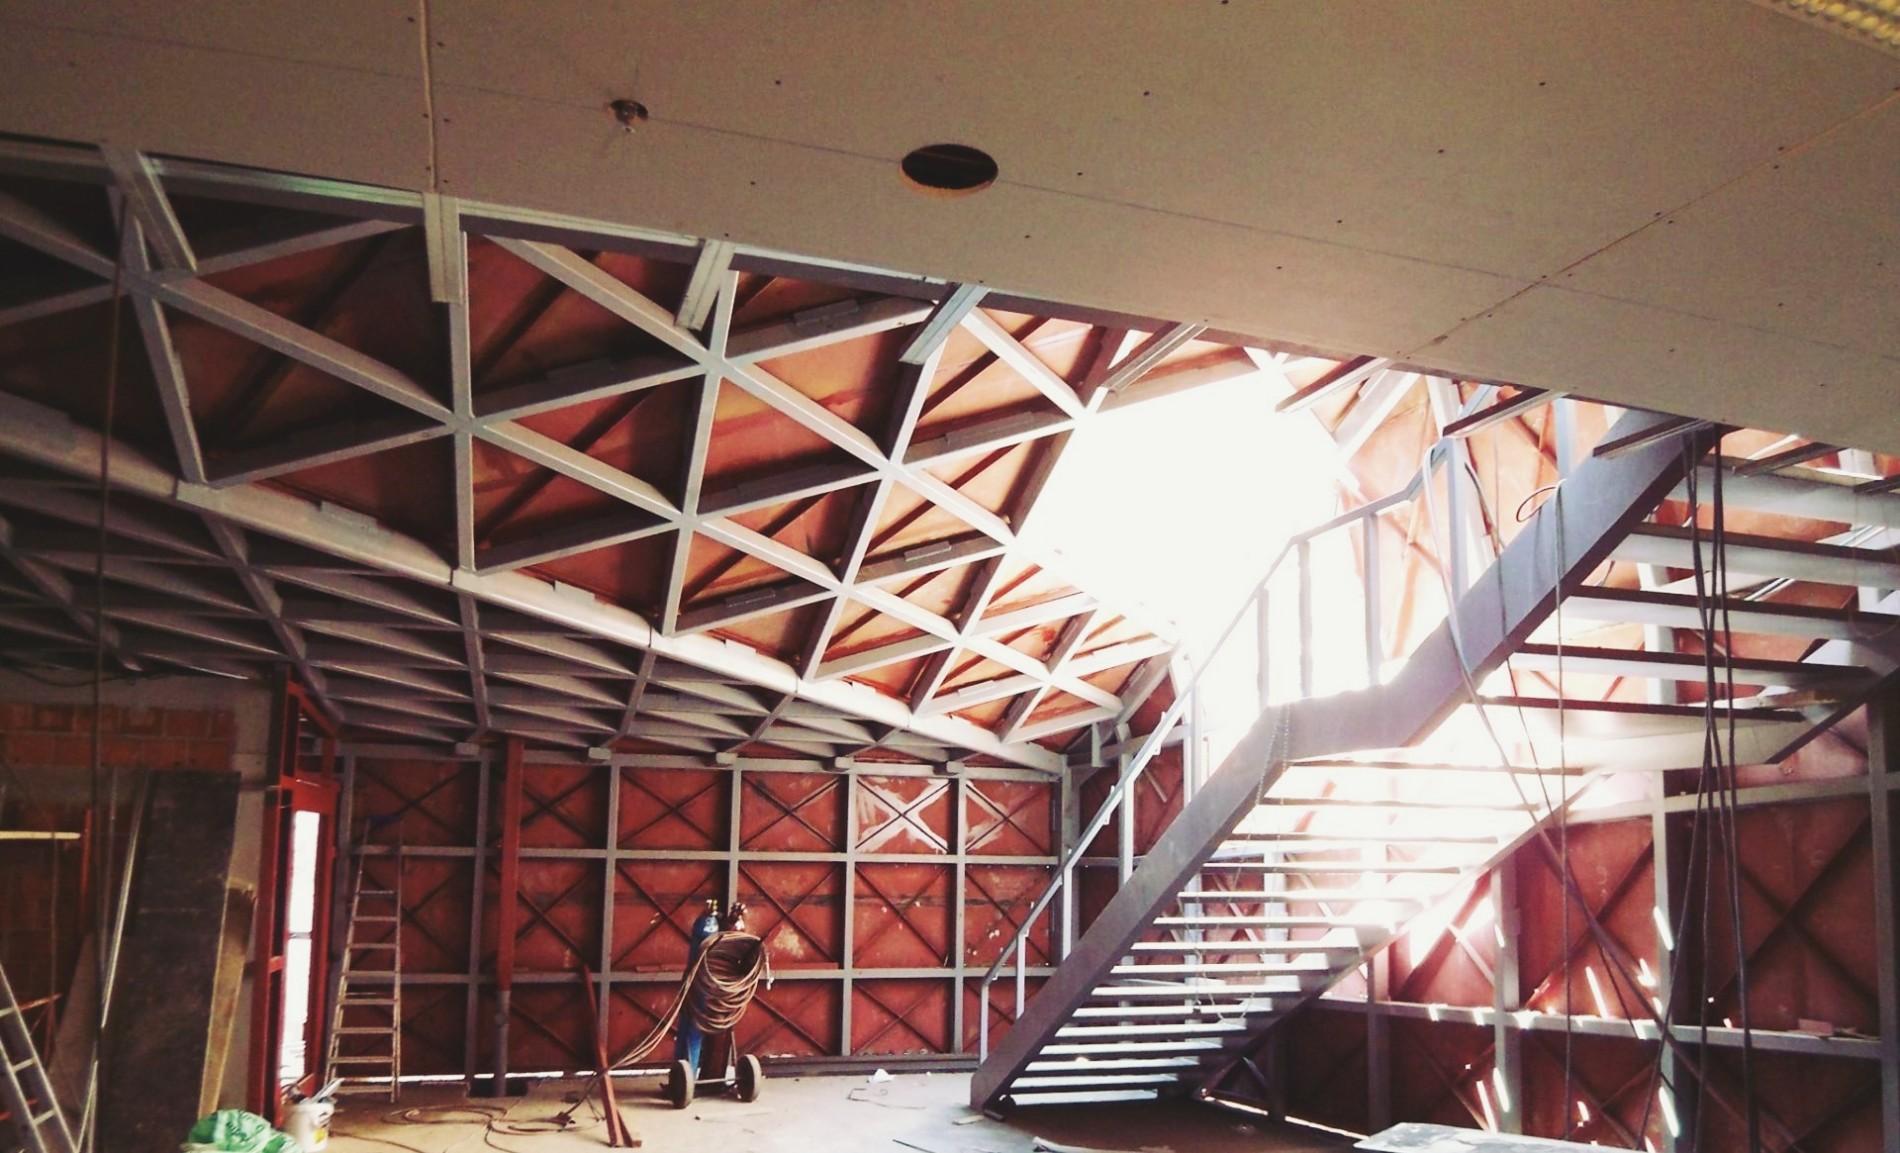 Plesni centar, zagrebački plesni centar, kino Lika, zagreb, upi-2m, 3LHD, ilica, hrvatska, croatia, dance studio Zagreb, ZAGREB DANCE CENTER, DANCE CENTER